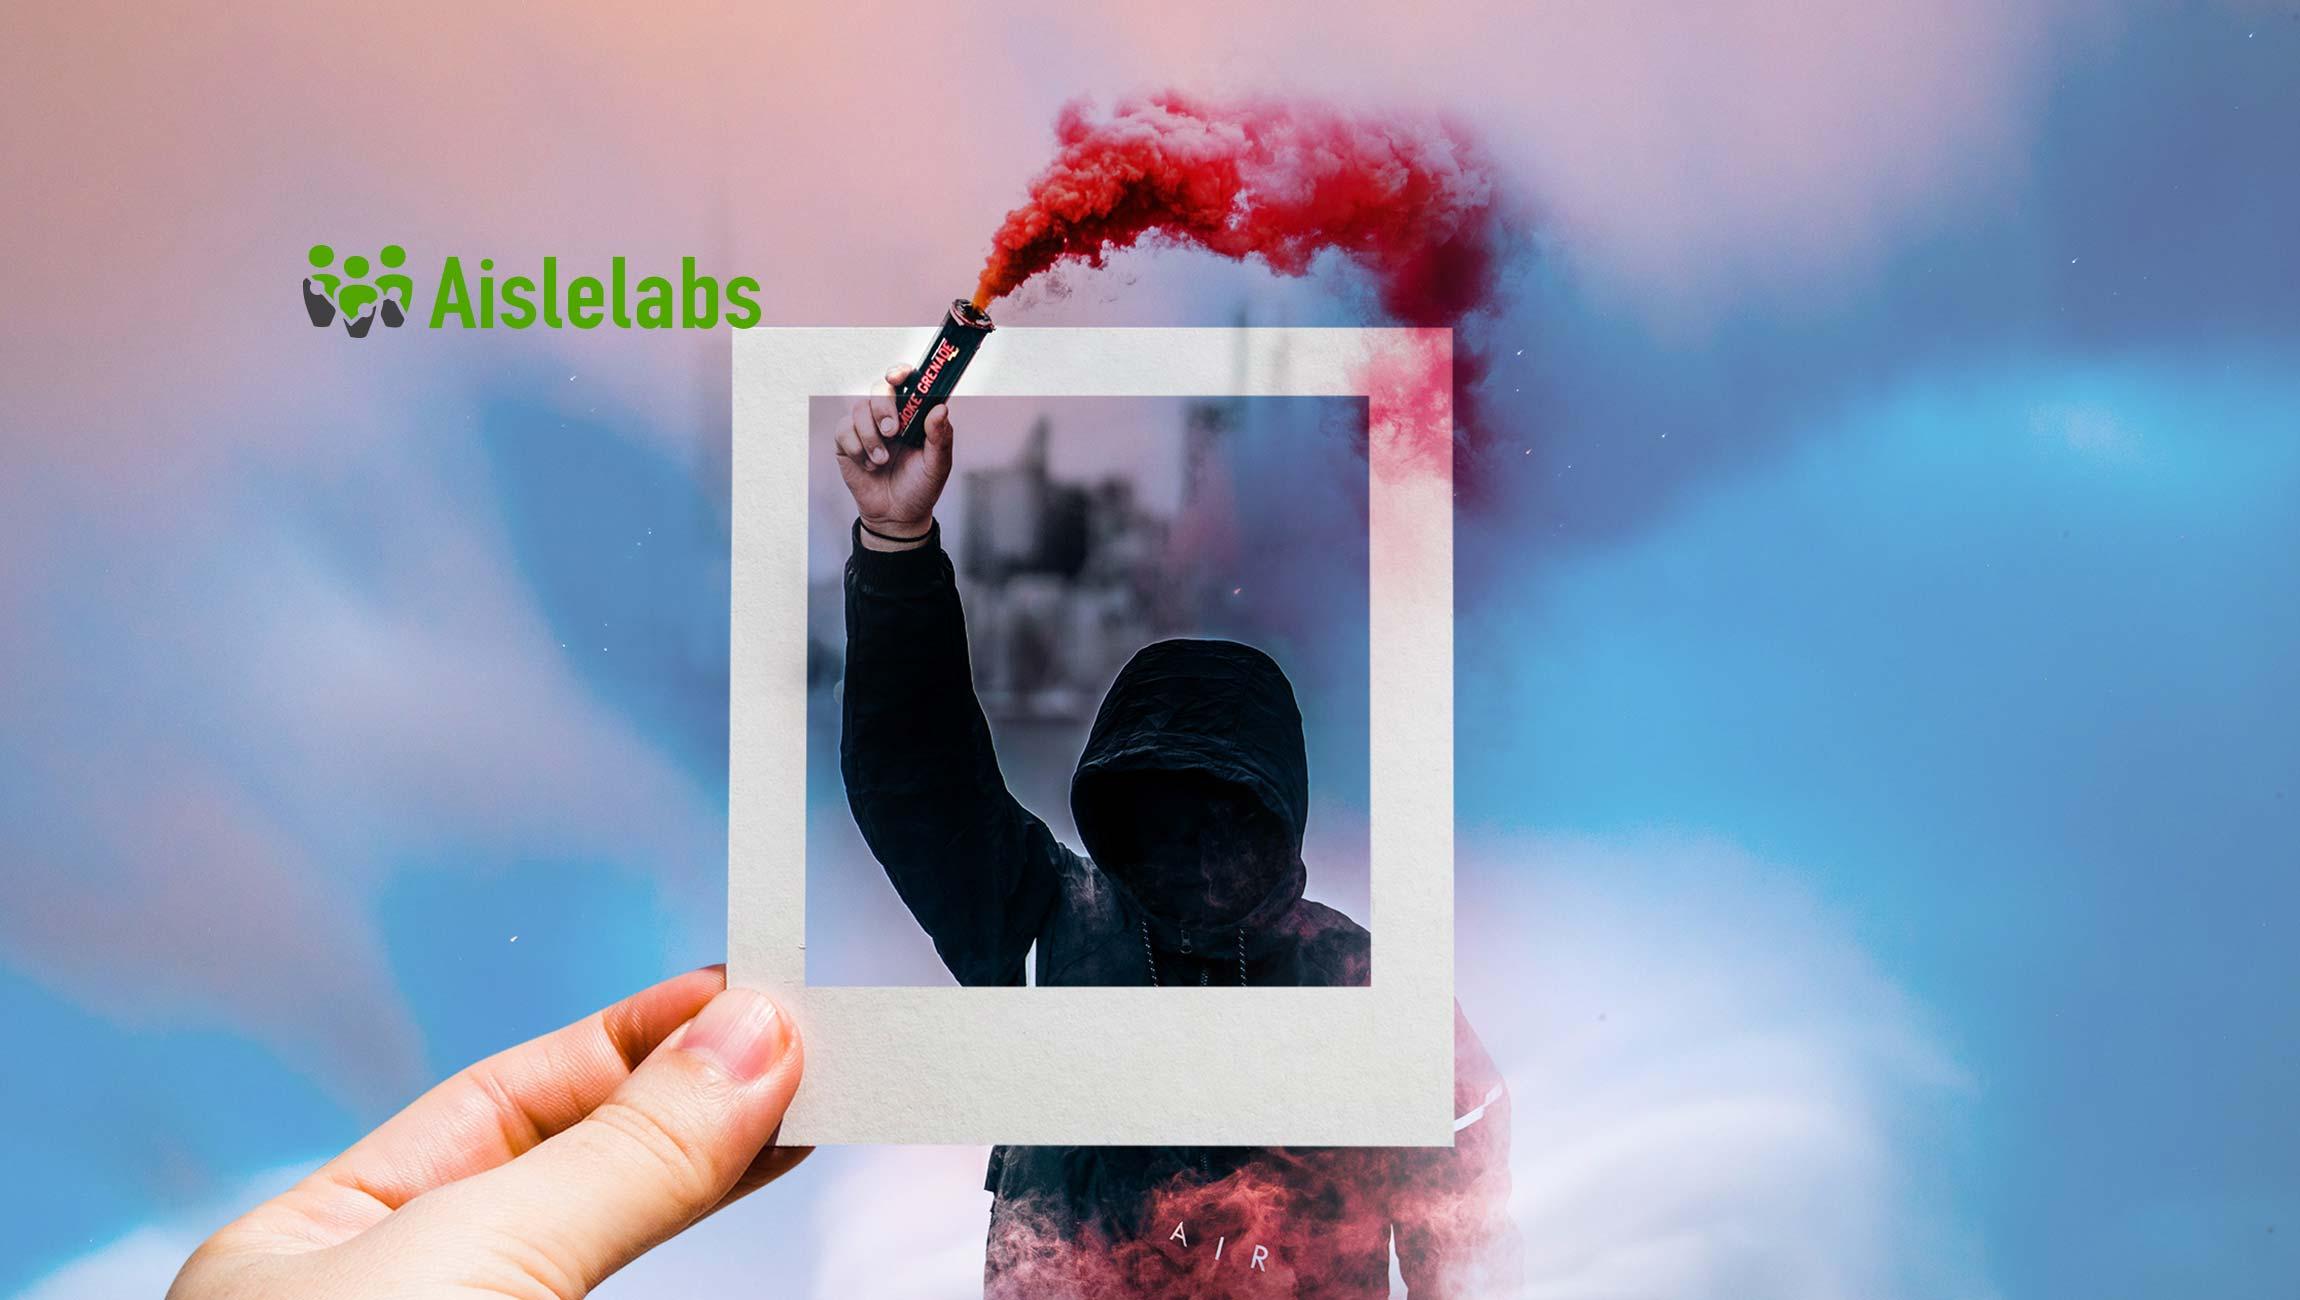 Aislelabs and Dallas Mavericks Premiere Use Case and Testimonial Video